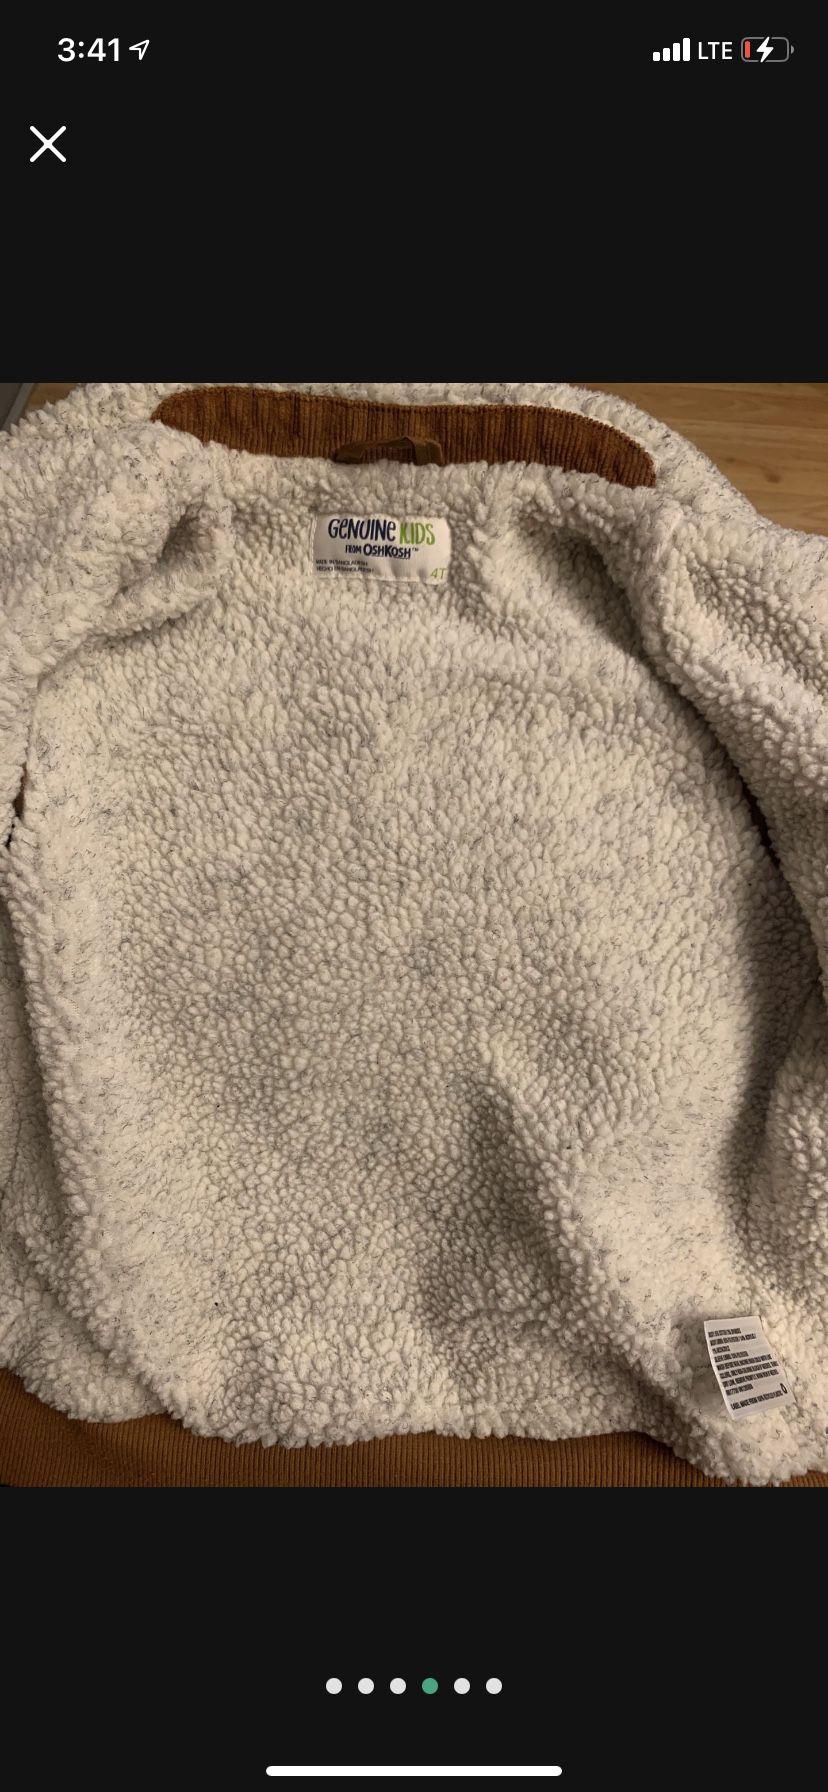 Nike Sweaters / Jacket Bundle